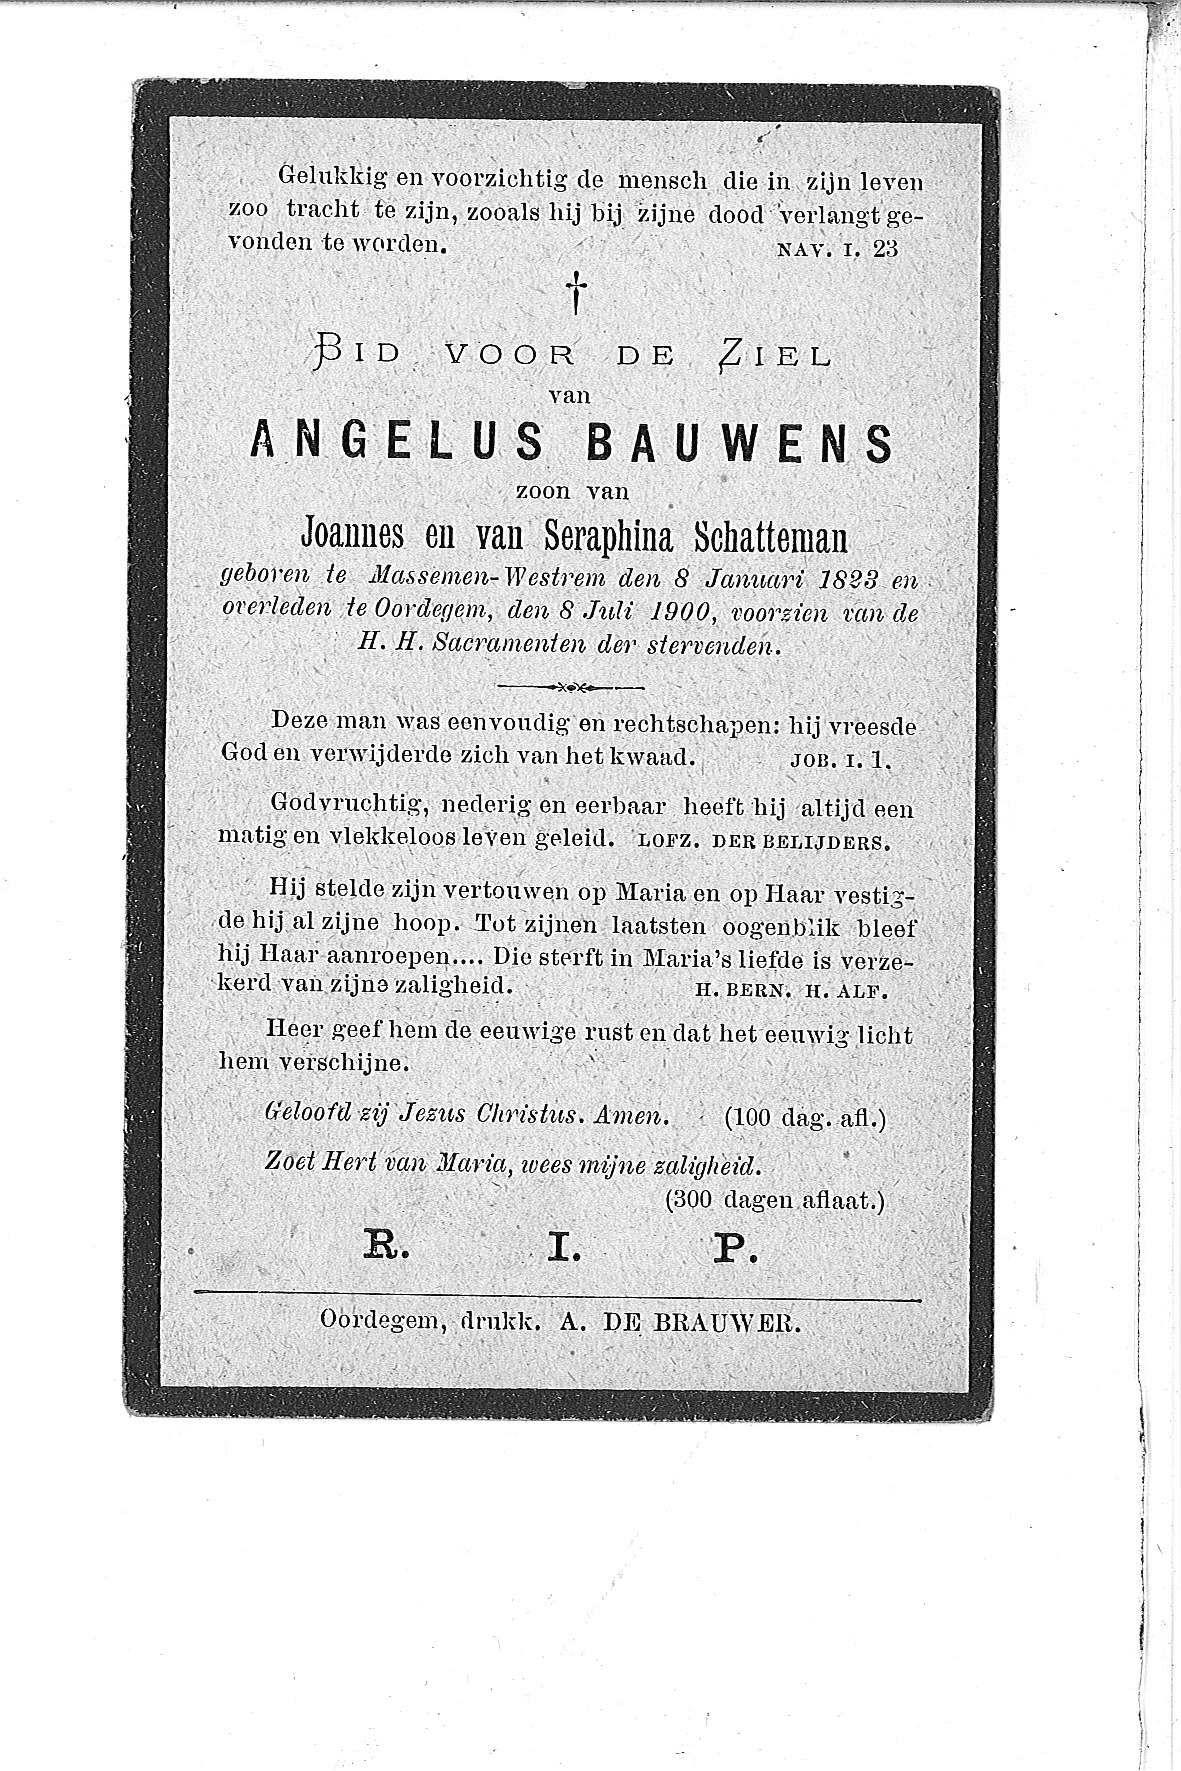 Angelus(1900)20101026093432_00010.jpg